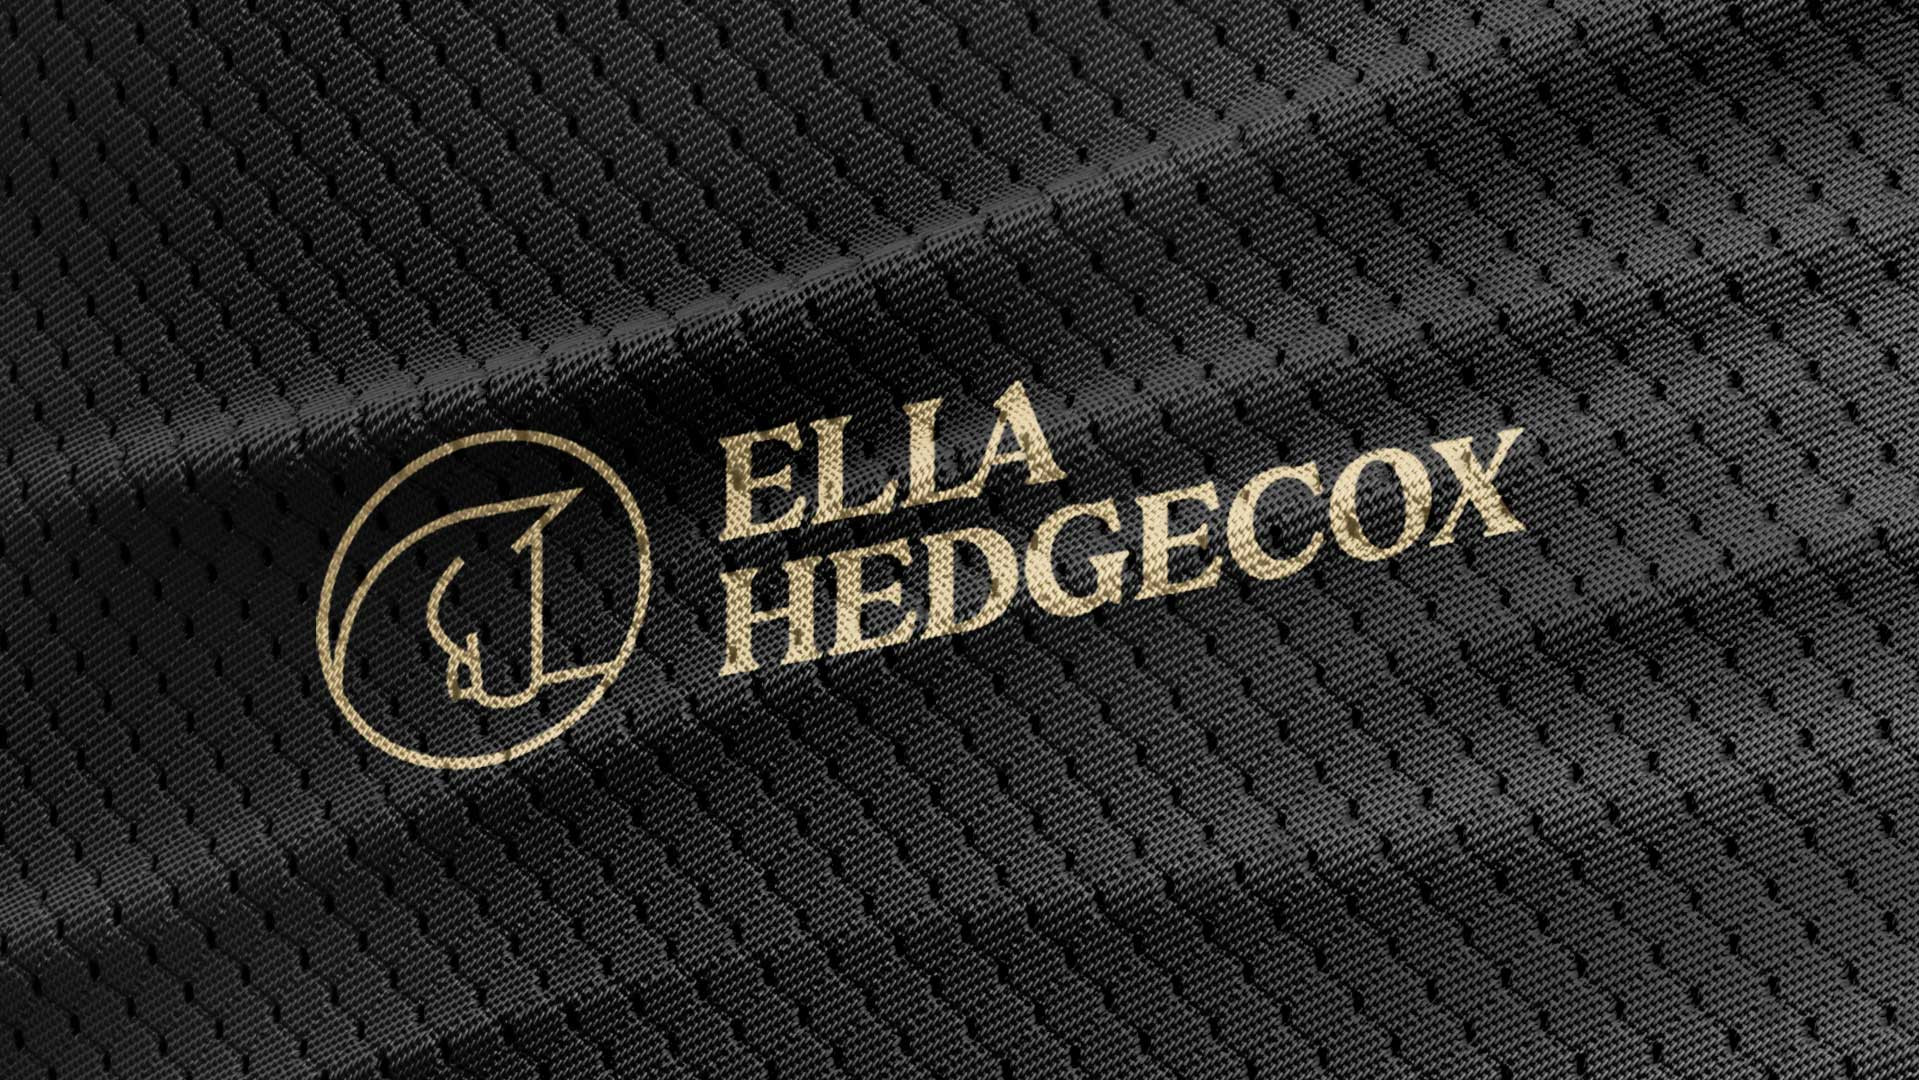 EllaHedgecox-Jersey-Concept